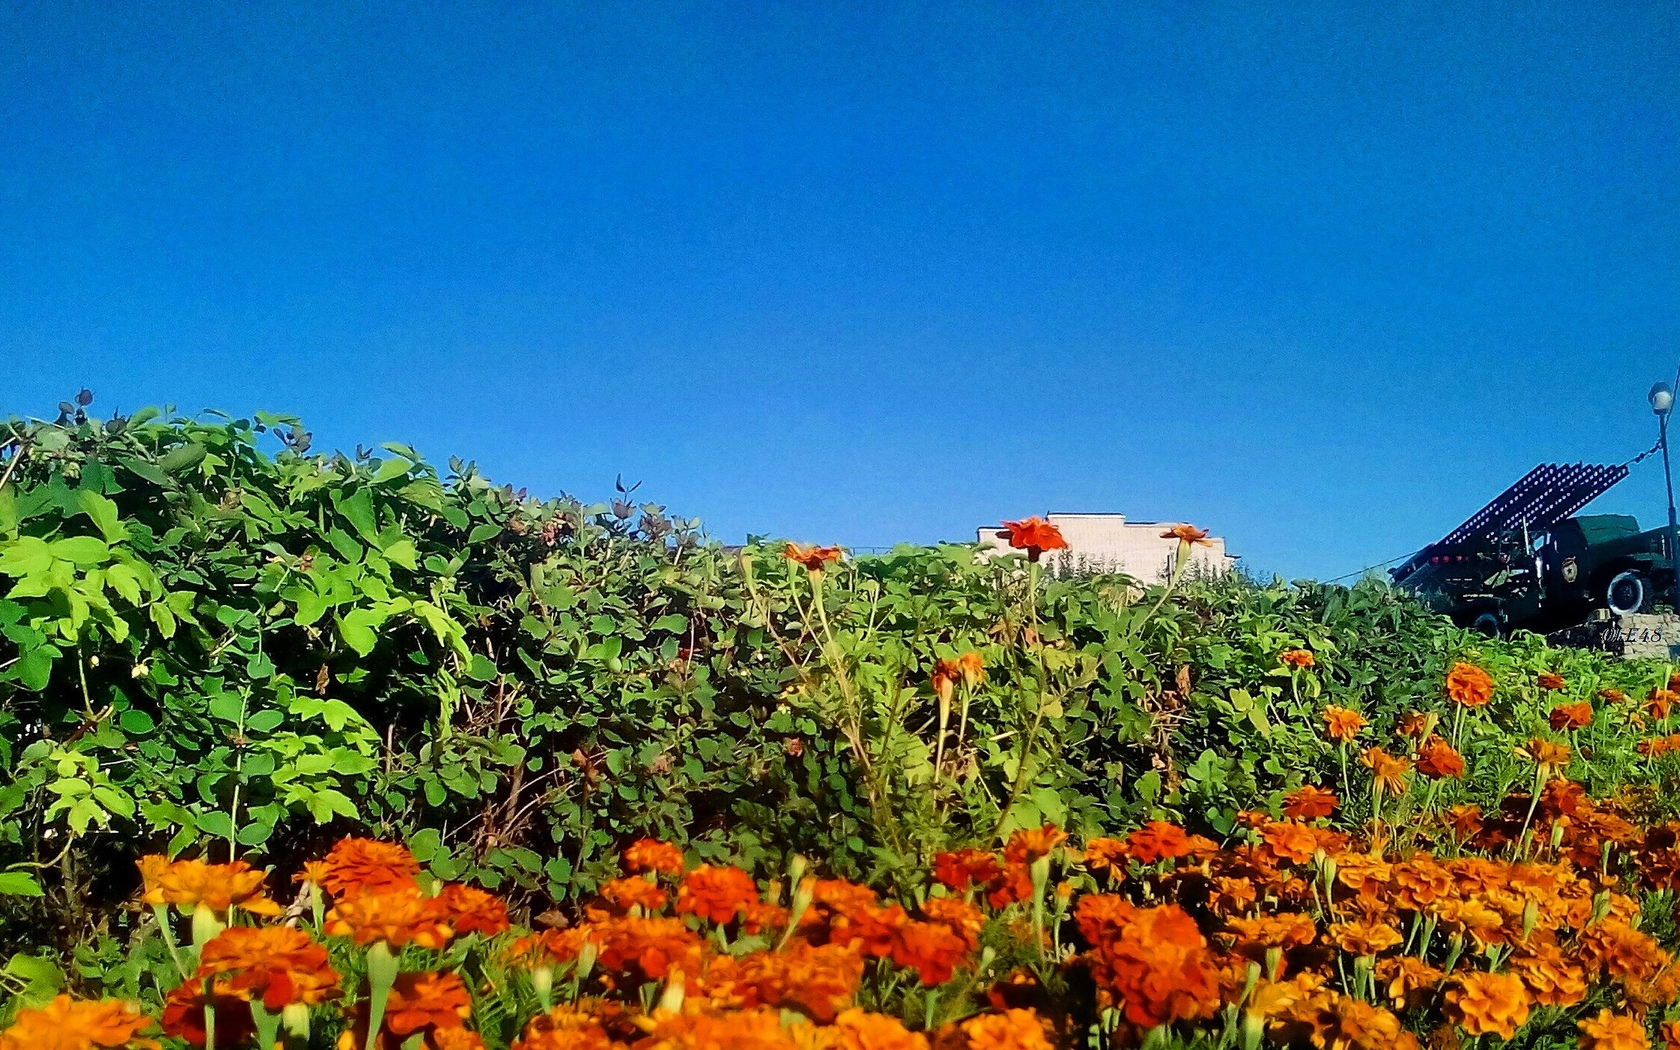 катюша, город, цветы